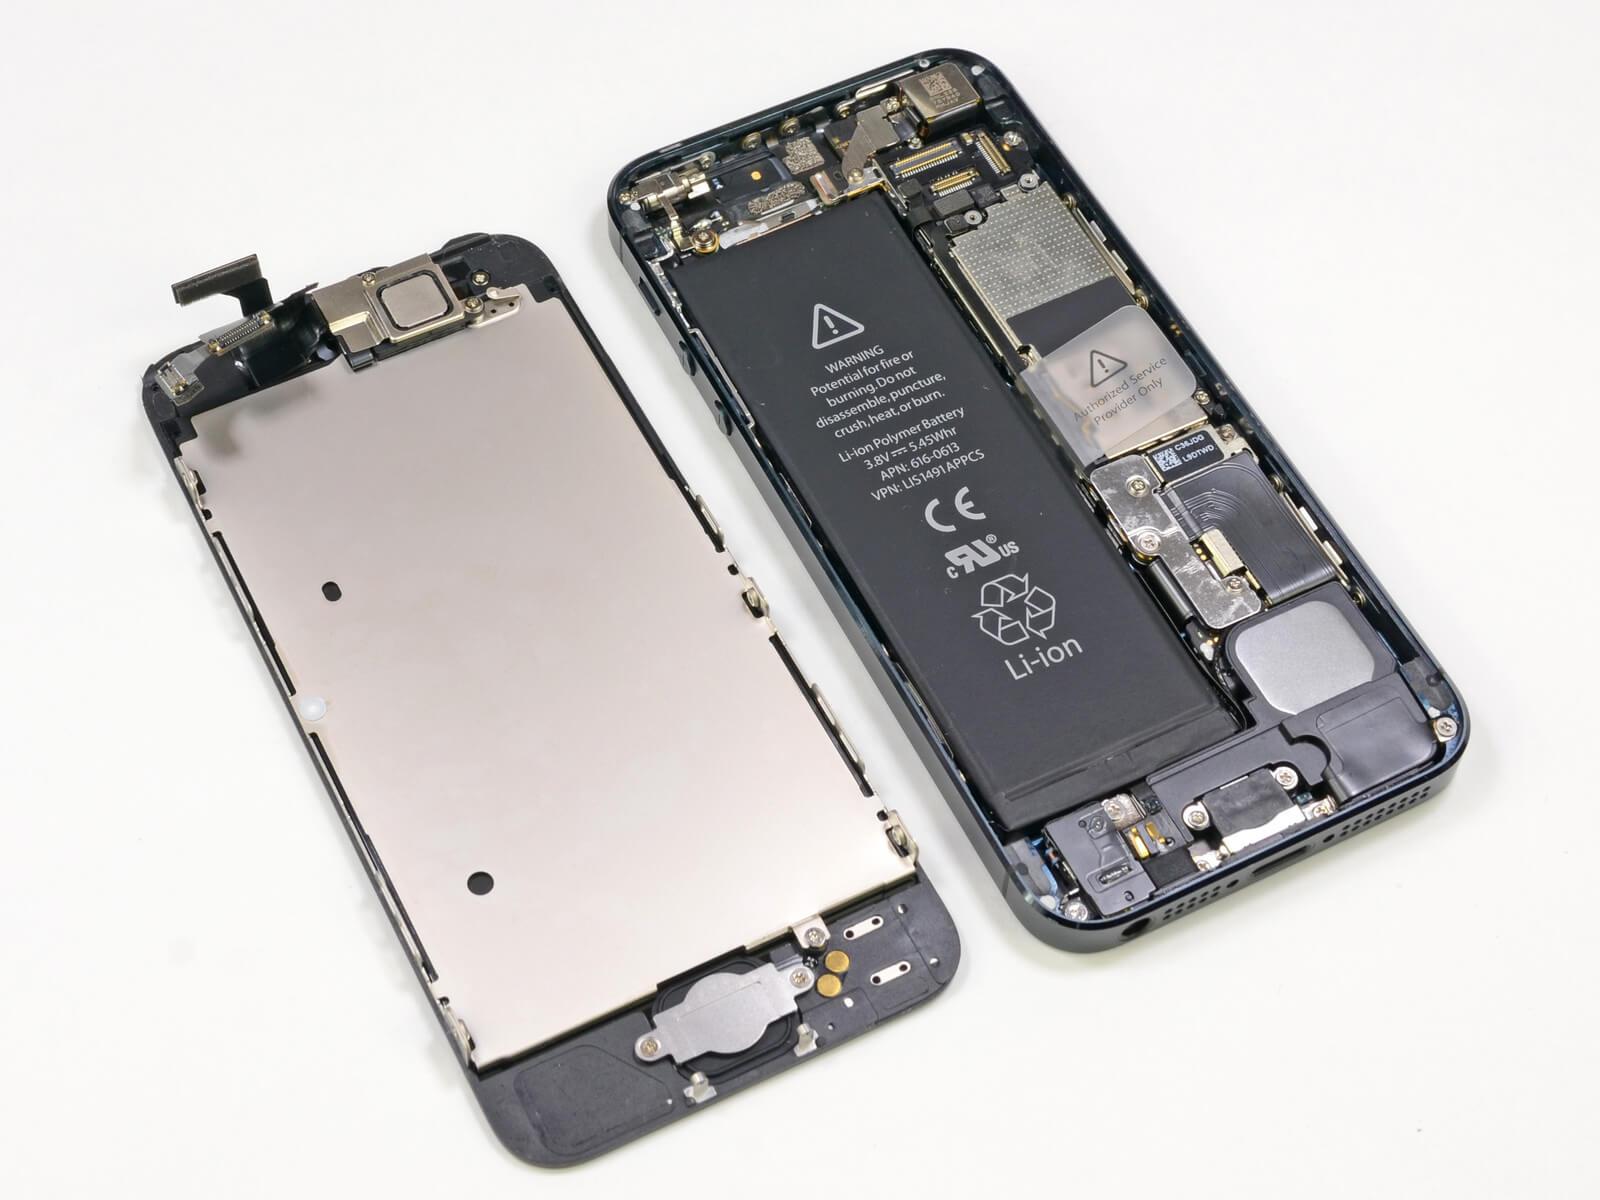 iphone 5 opened2